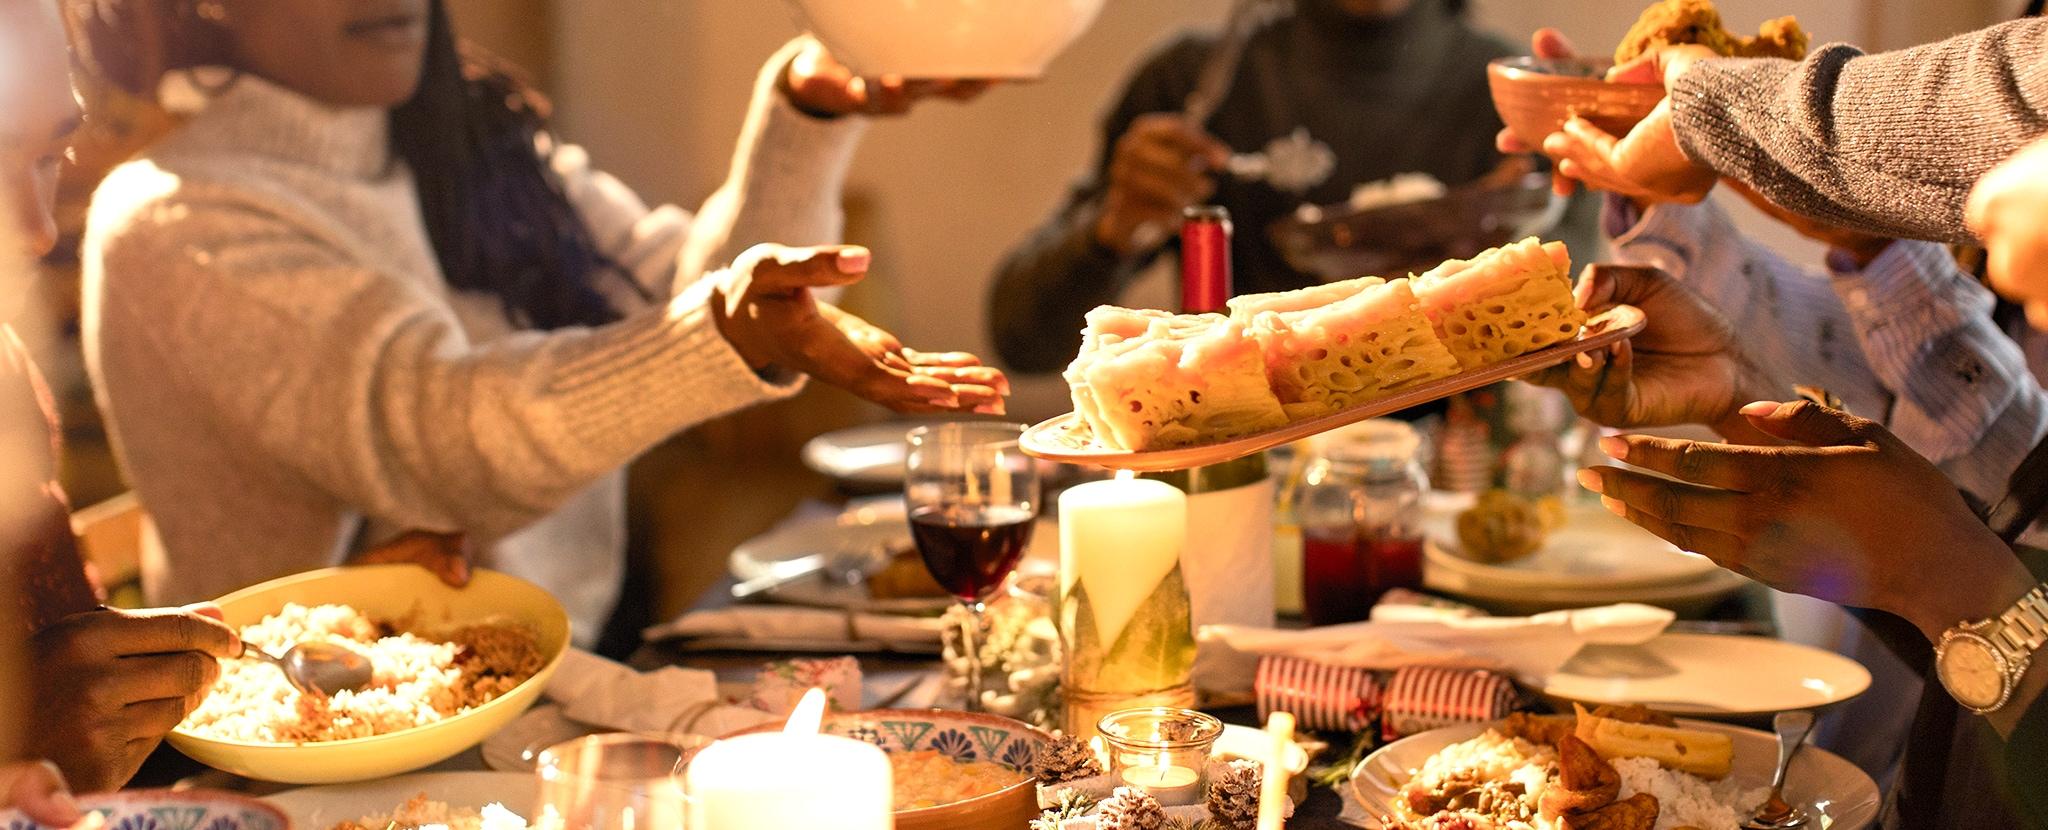 Holiday RealiTEAS | Lipton US